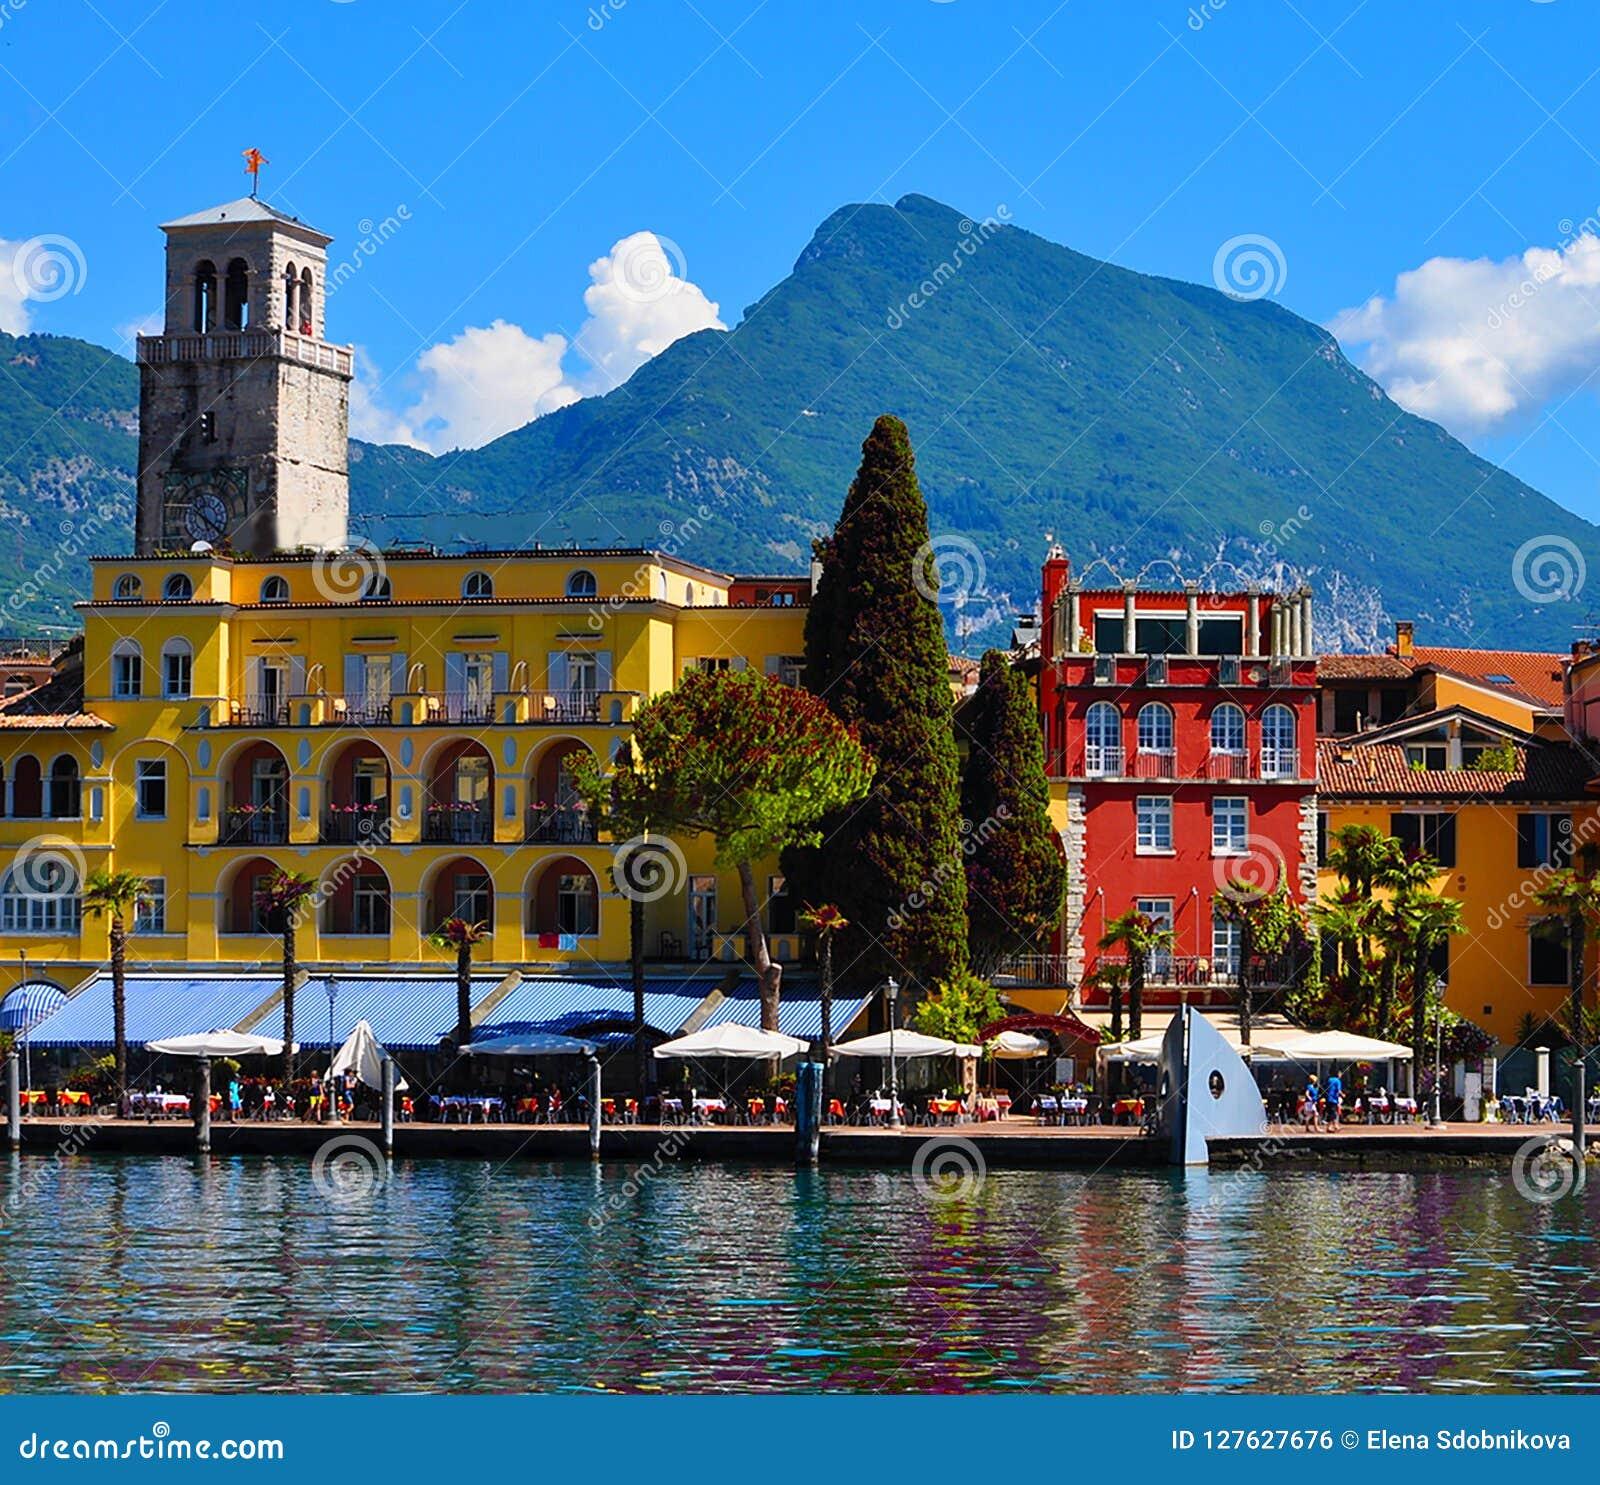 Beautiful view of Riva del Garda, of the embankment, cafes and restaurants. Lake Garda, region Lombardia, Italy